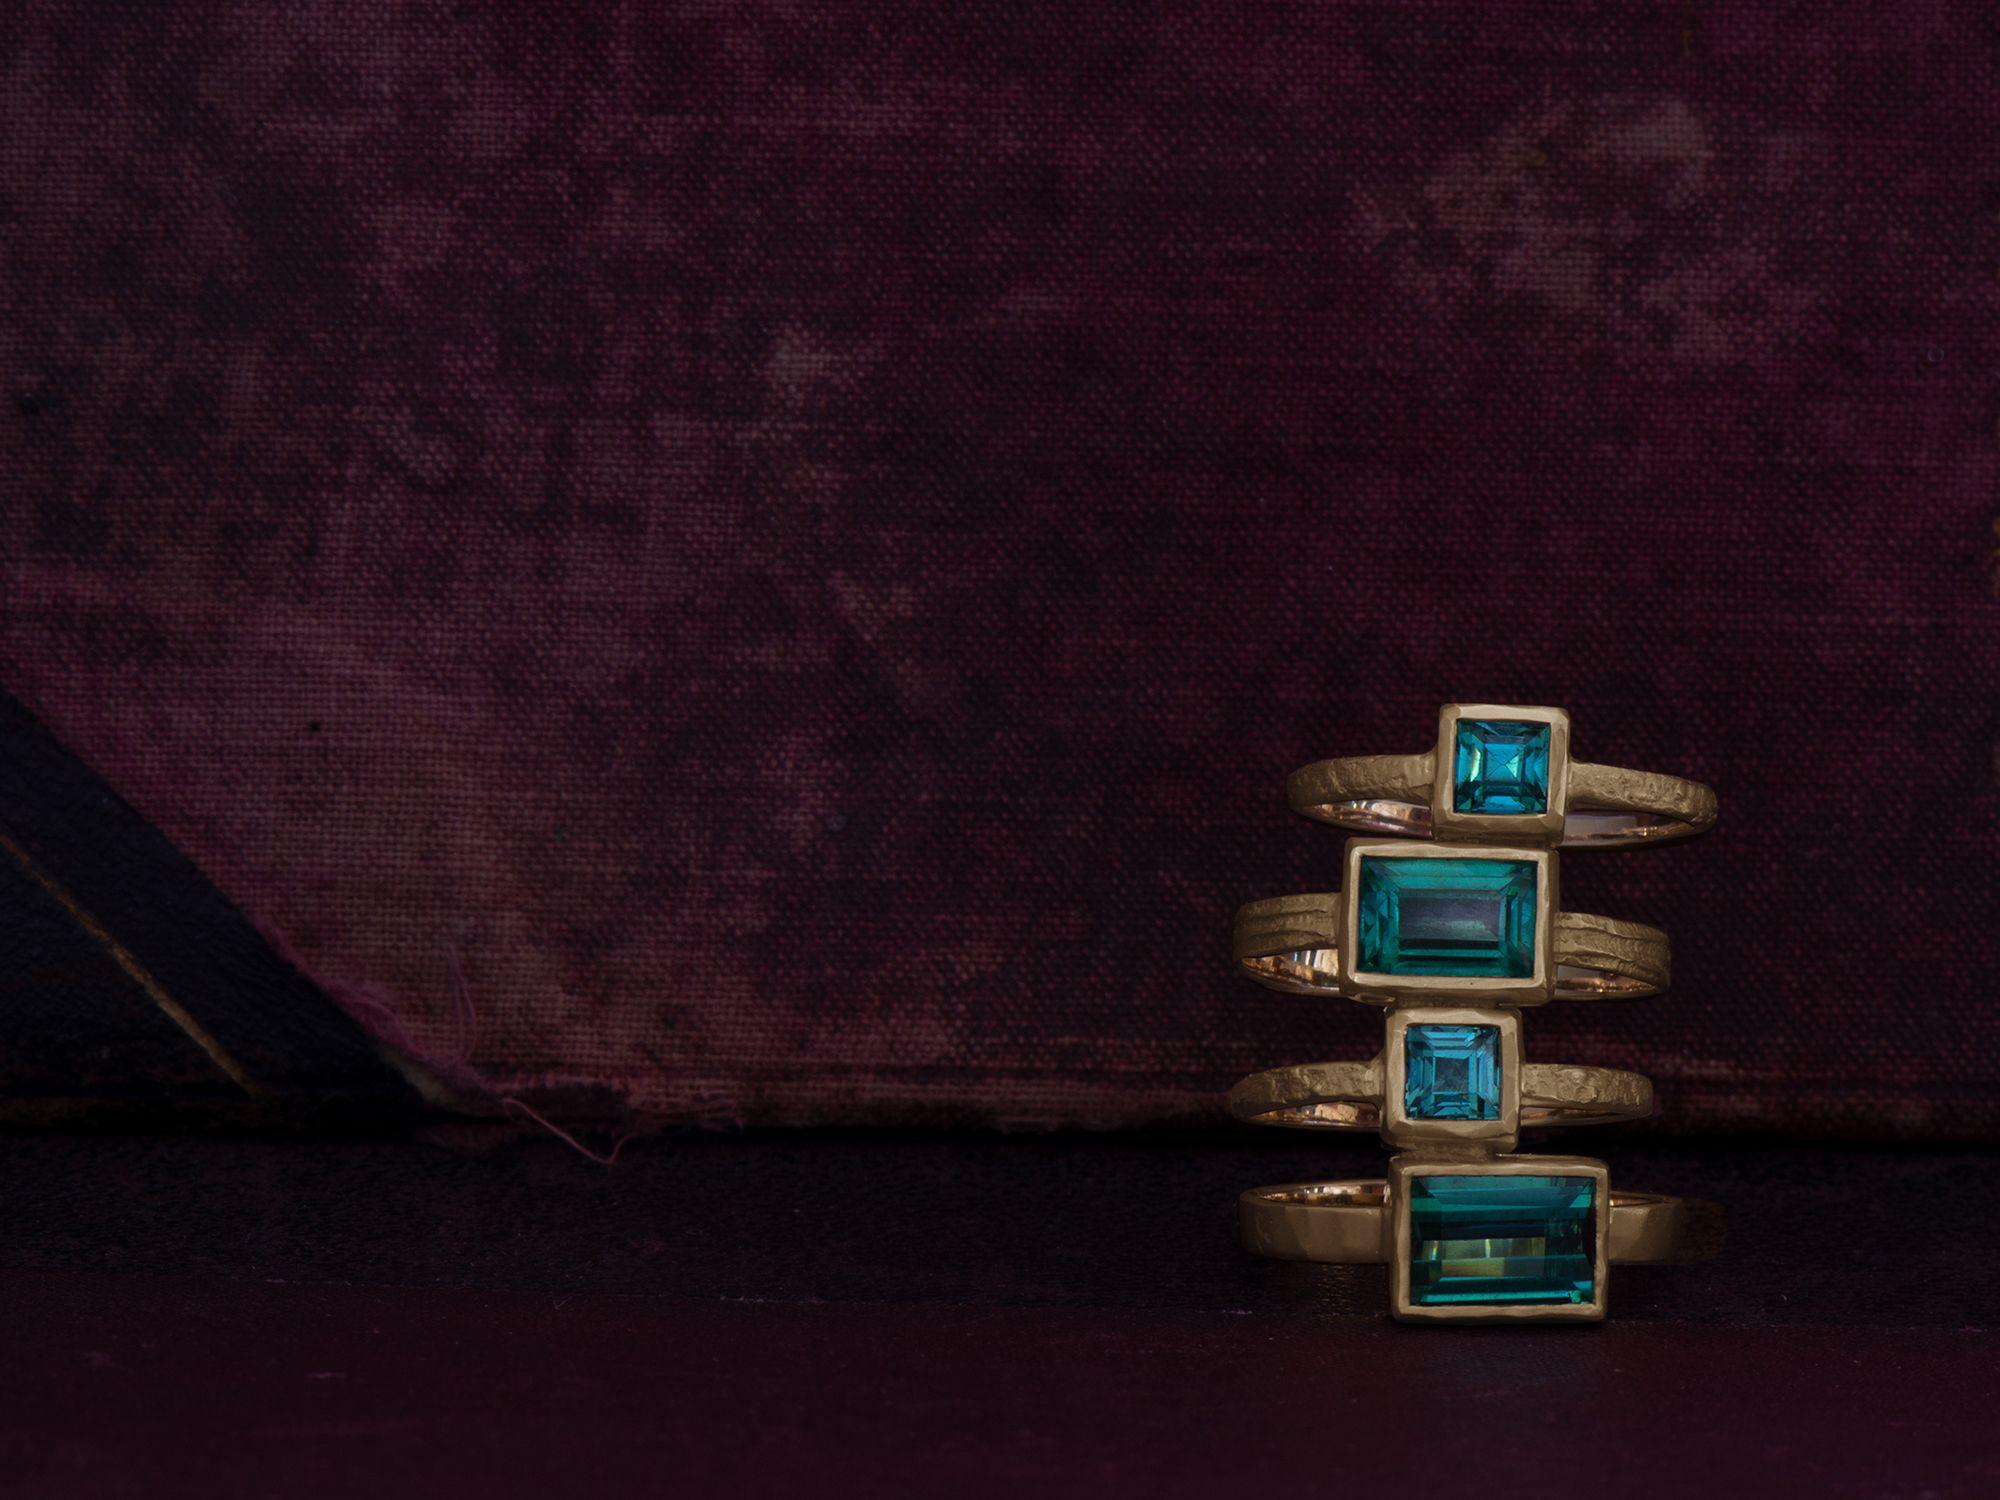 Melisande tourmaline rings by Emmanuelle Zysman